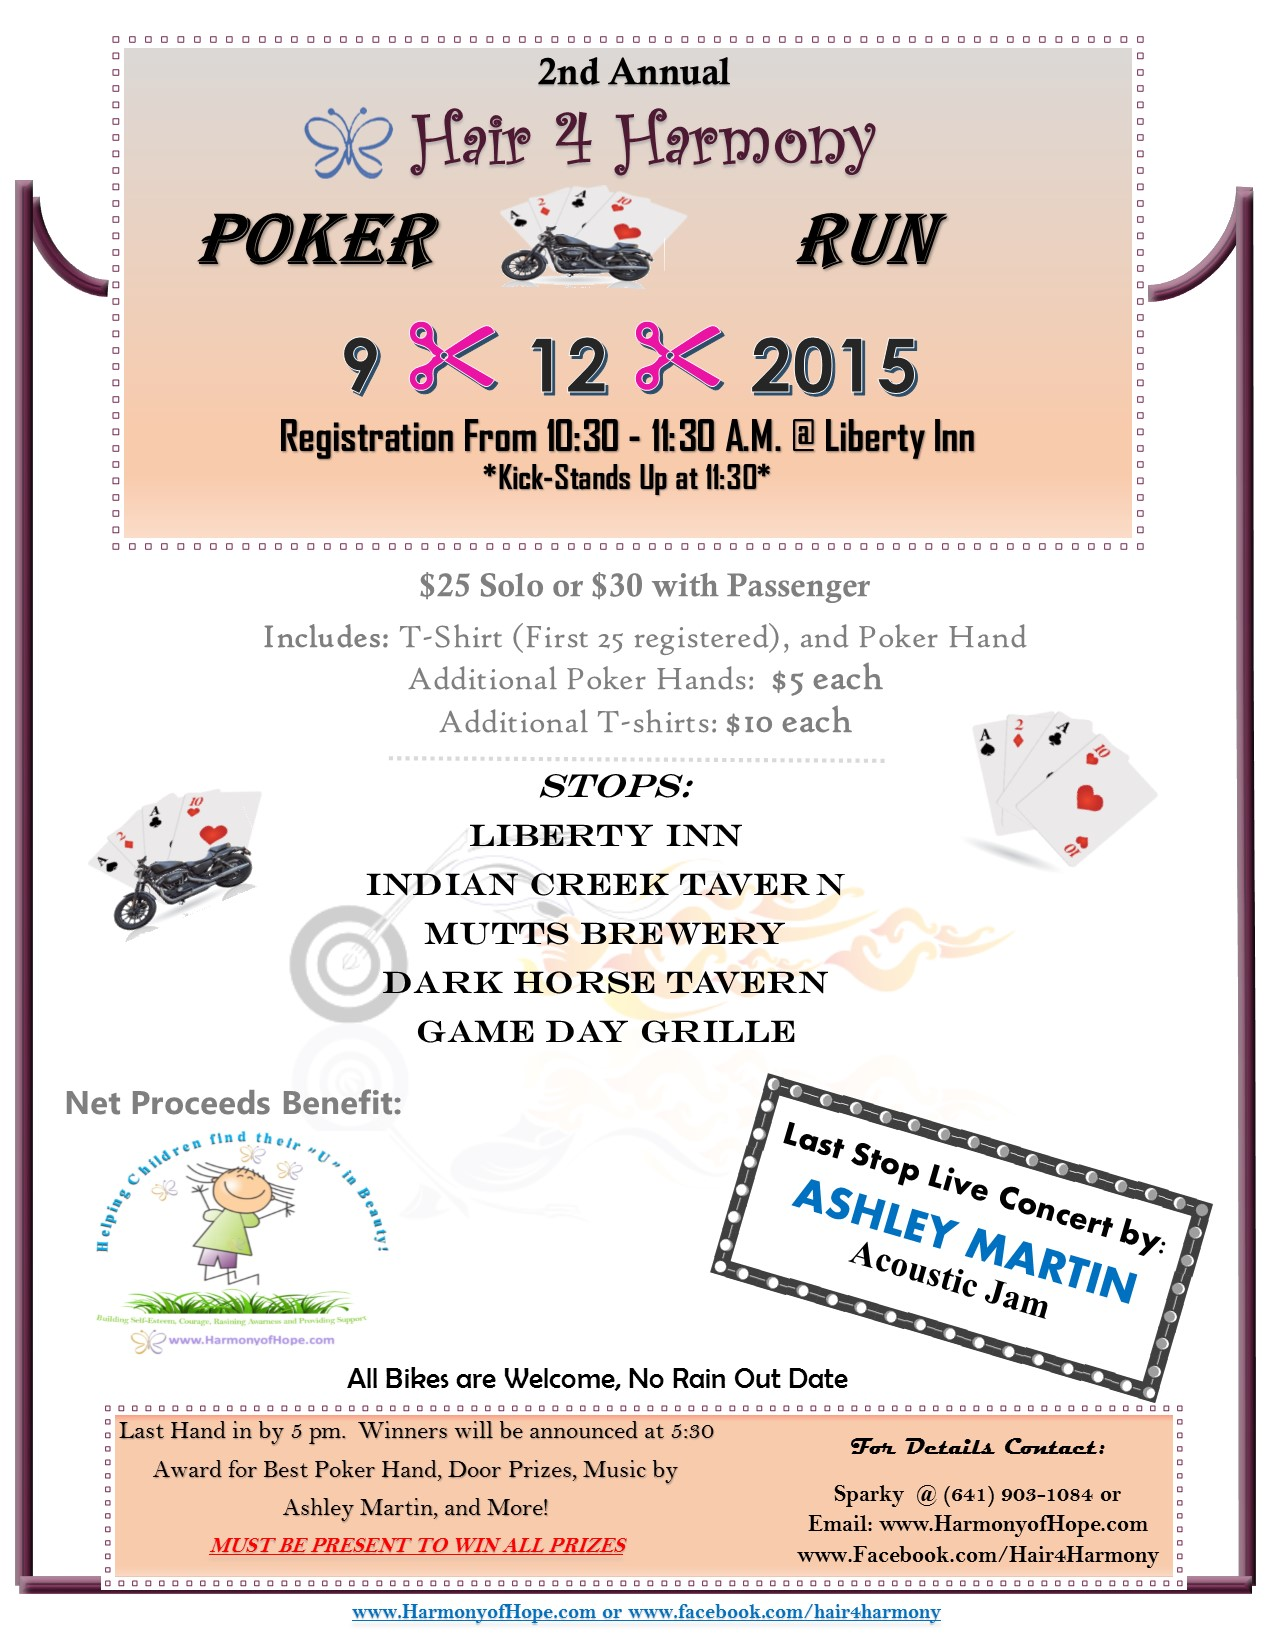 Princeton poker run